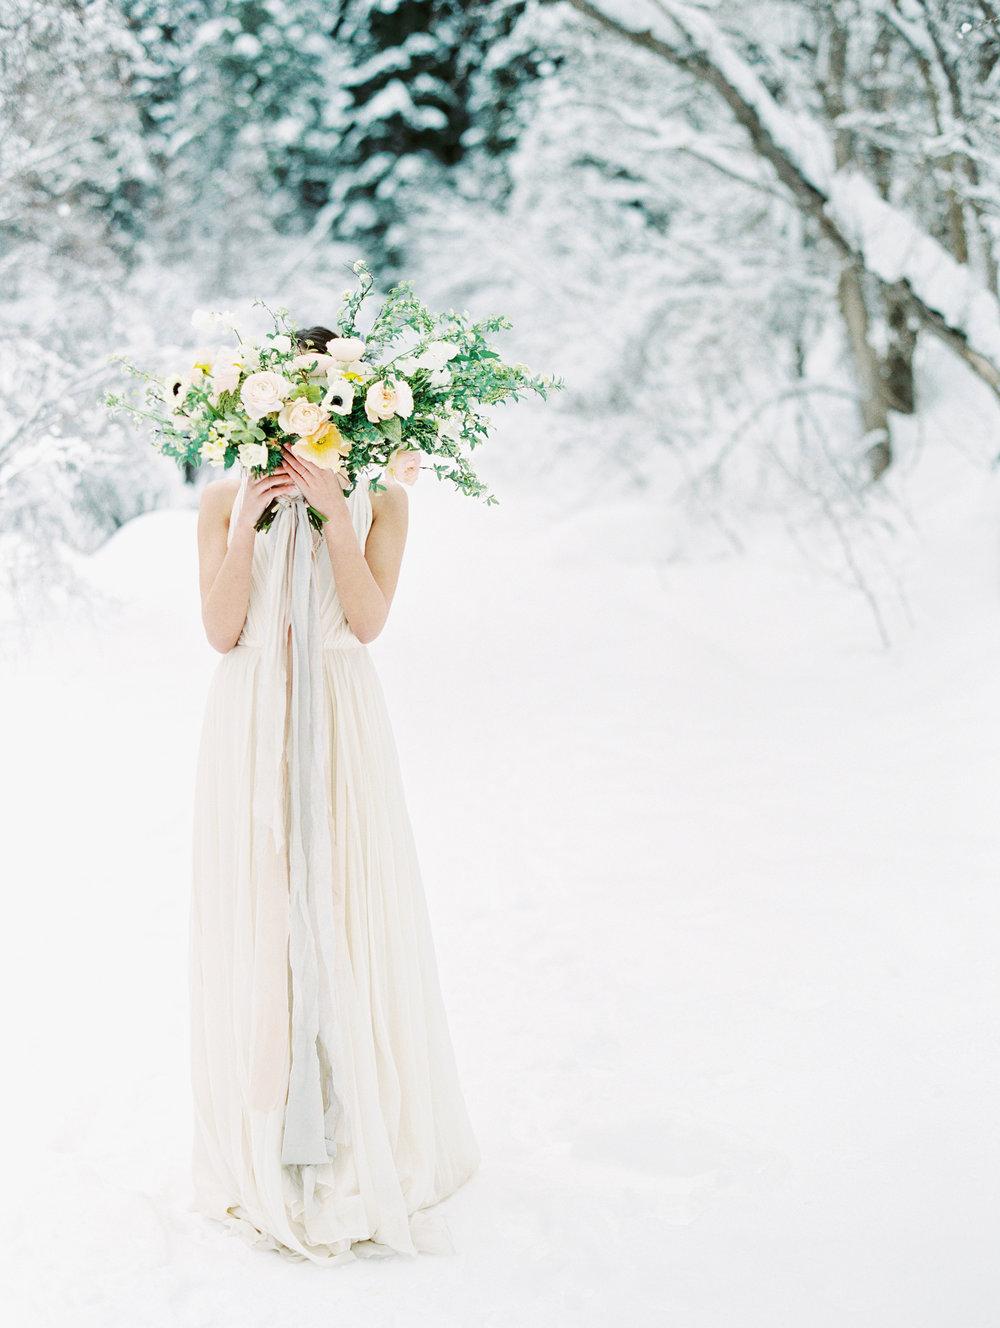 BellaCosa_WinterWonderland-10.jpg